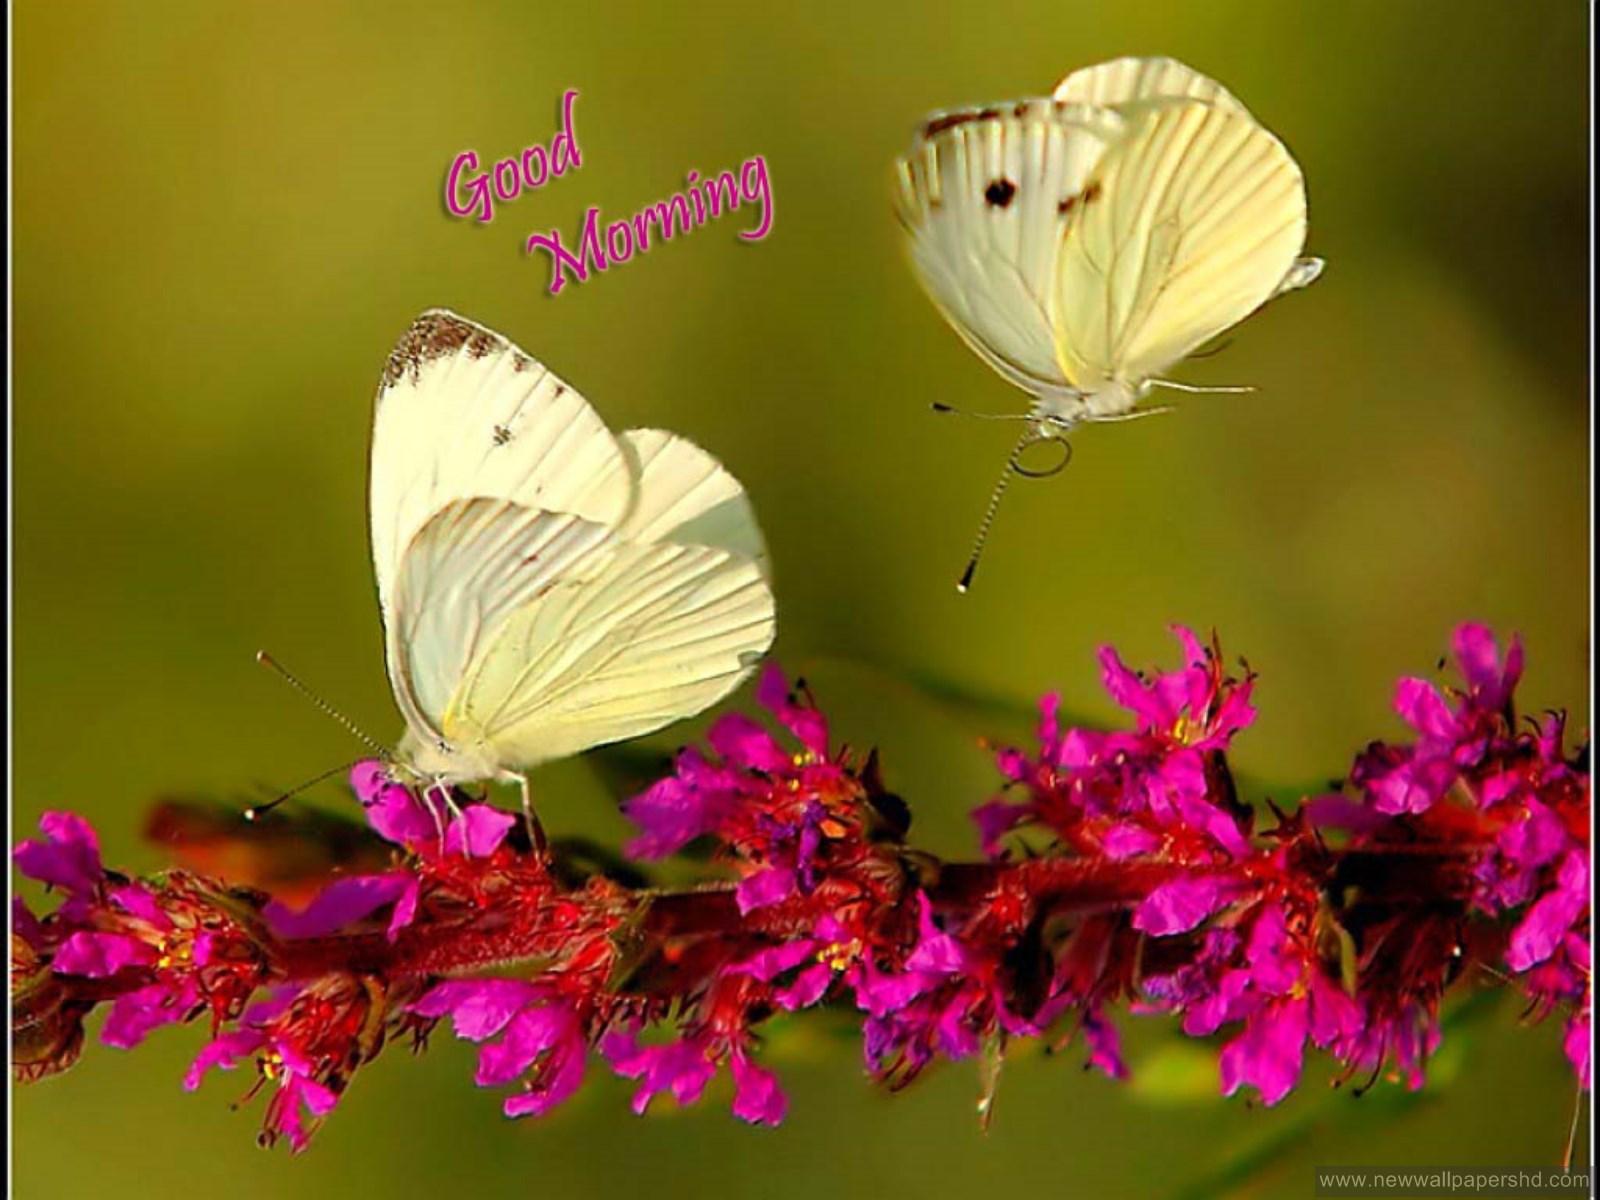 Hd wallpaper of good morning - Free Download Good Morning Wishes Hd Wallpapers Quotes Images 1600x1200